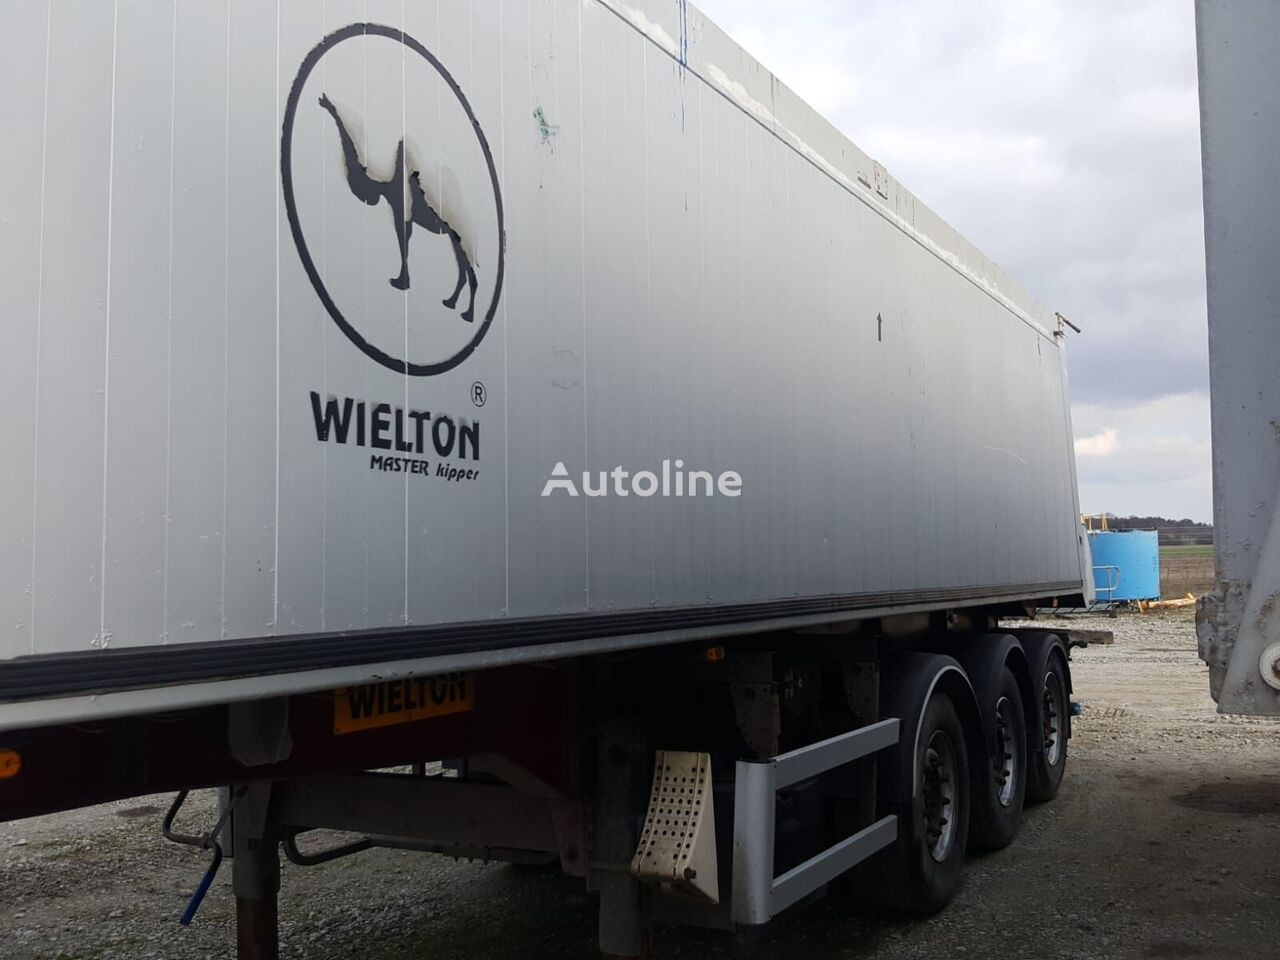 WIELTON 42M poluprikolica kipera